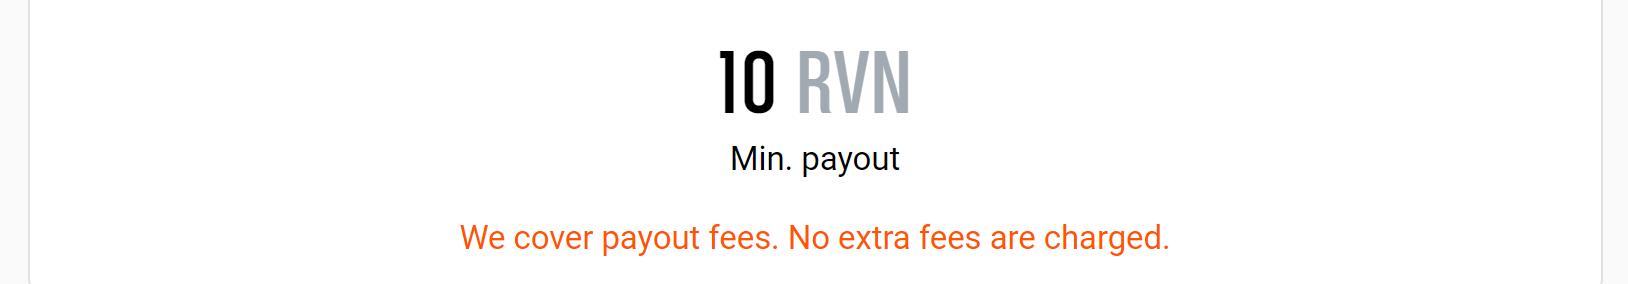 10_rvn_min_payout